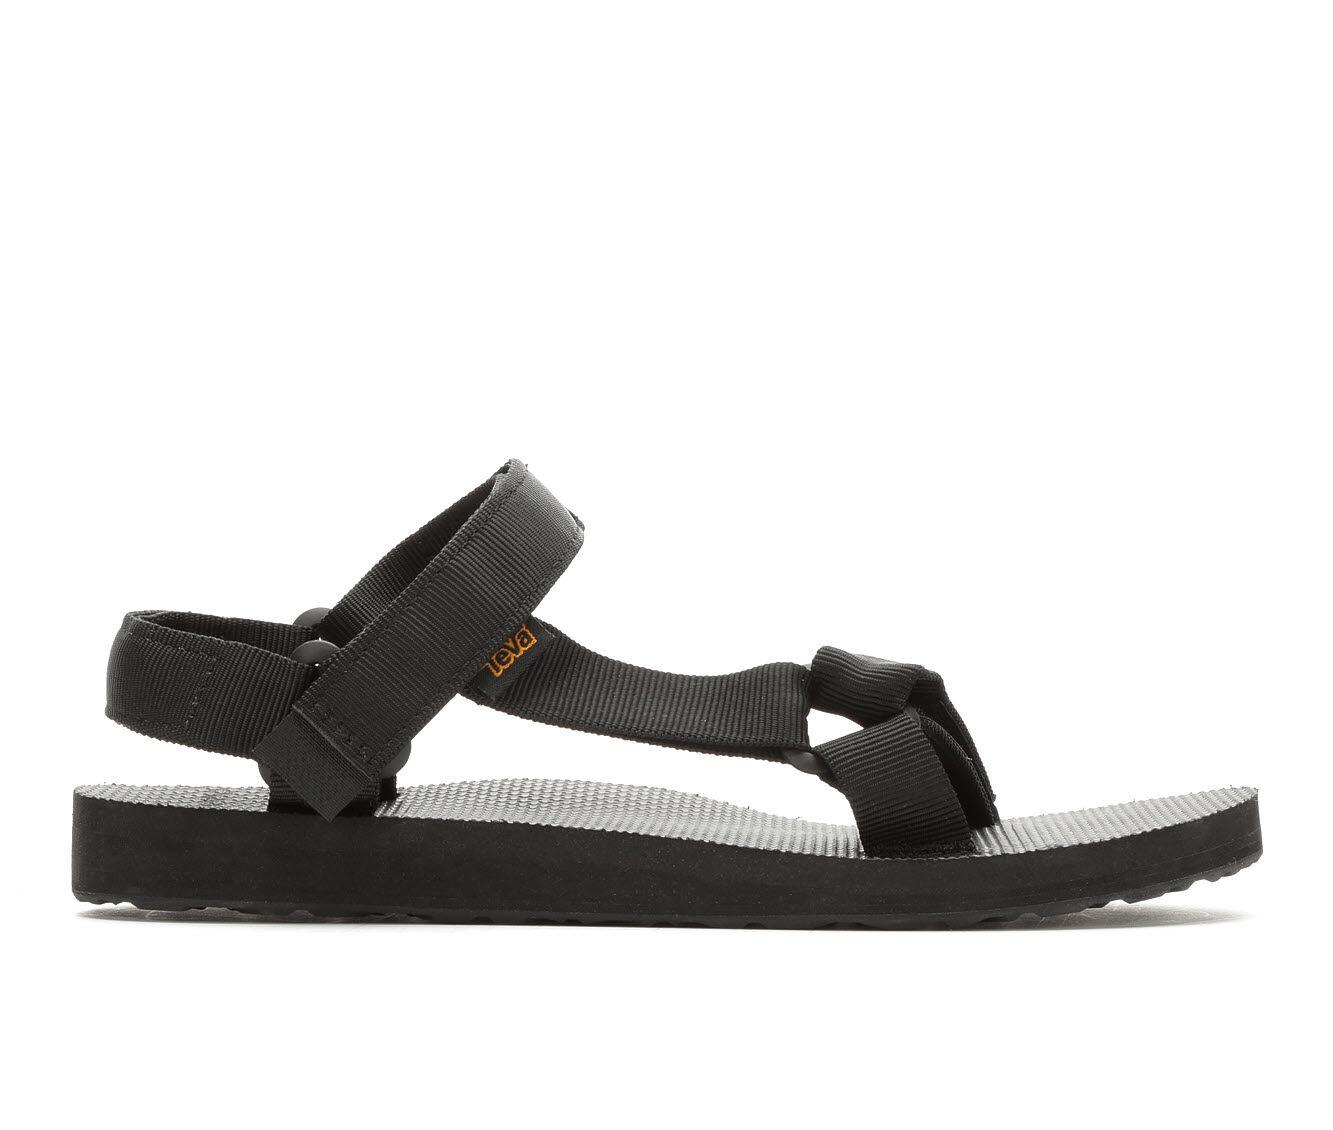 Women's Teva Original Universal Hiking Sandals Black